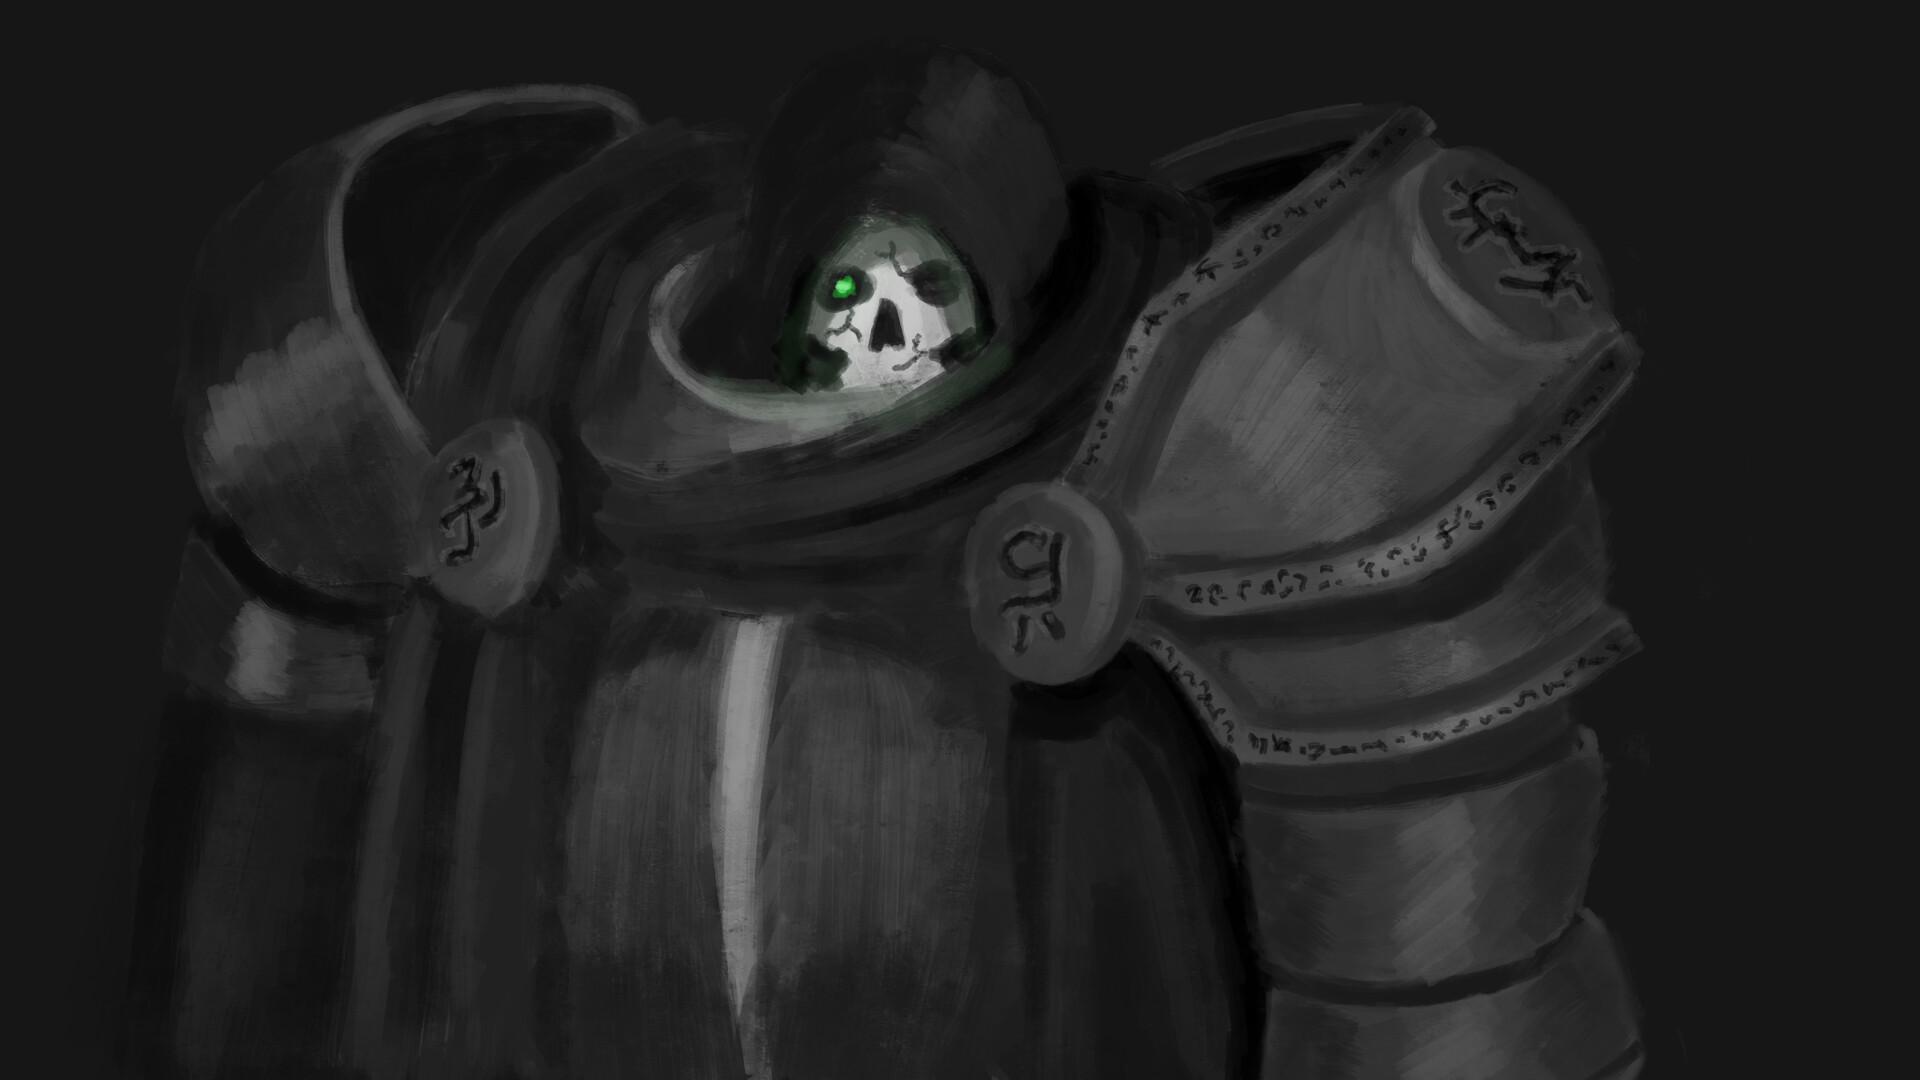 Nikita perepelitsyn death knight